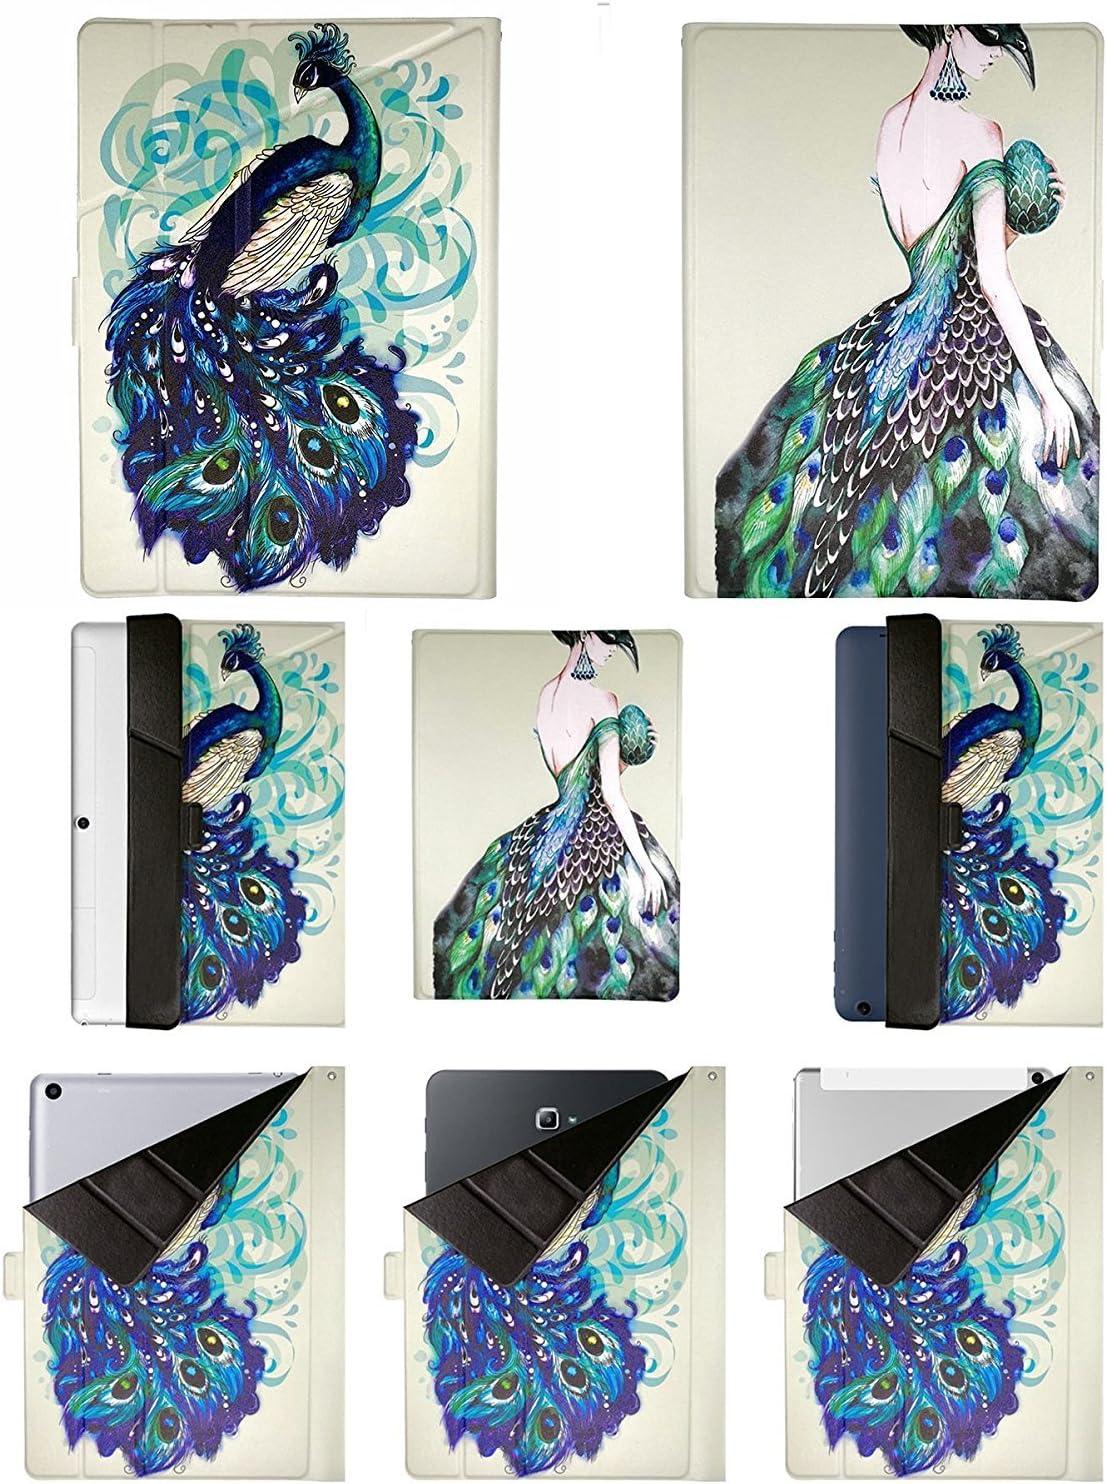 Lovewlb Tablet Funda para Airis Onepad 1100x2 Tab11e Funda Soporte Cuero Case Cover SN